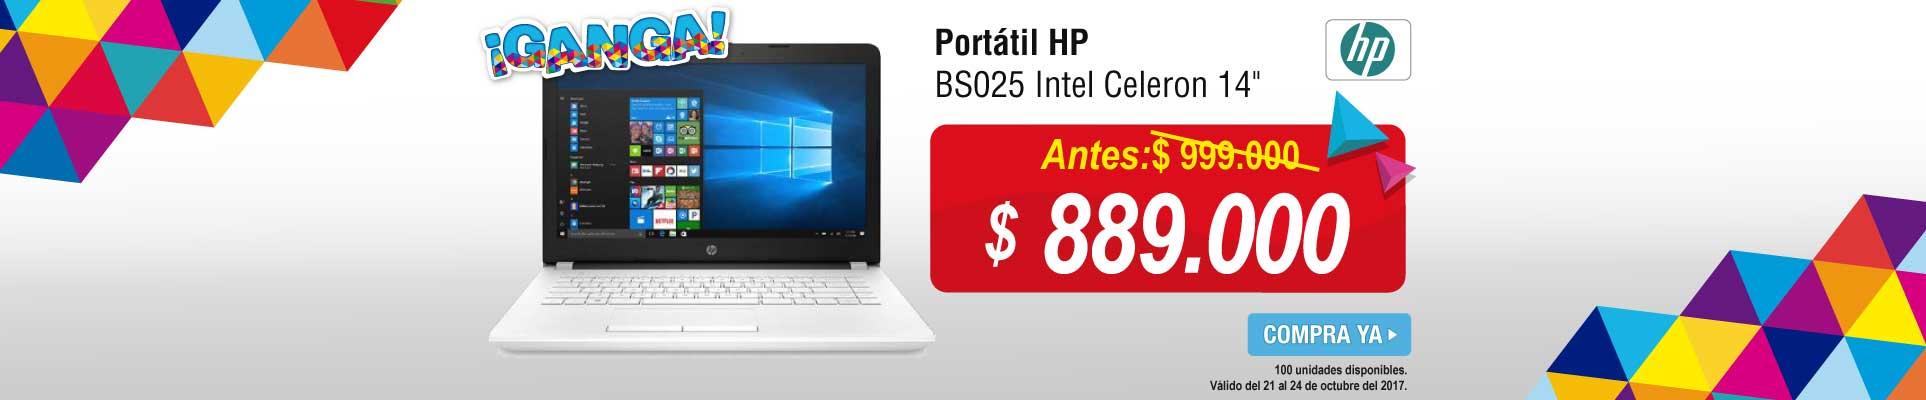 PPAL ALKP-5-computadores-Portátil HP BS025 Intel Celeron 14-prod-octubre21-24